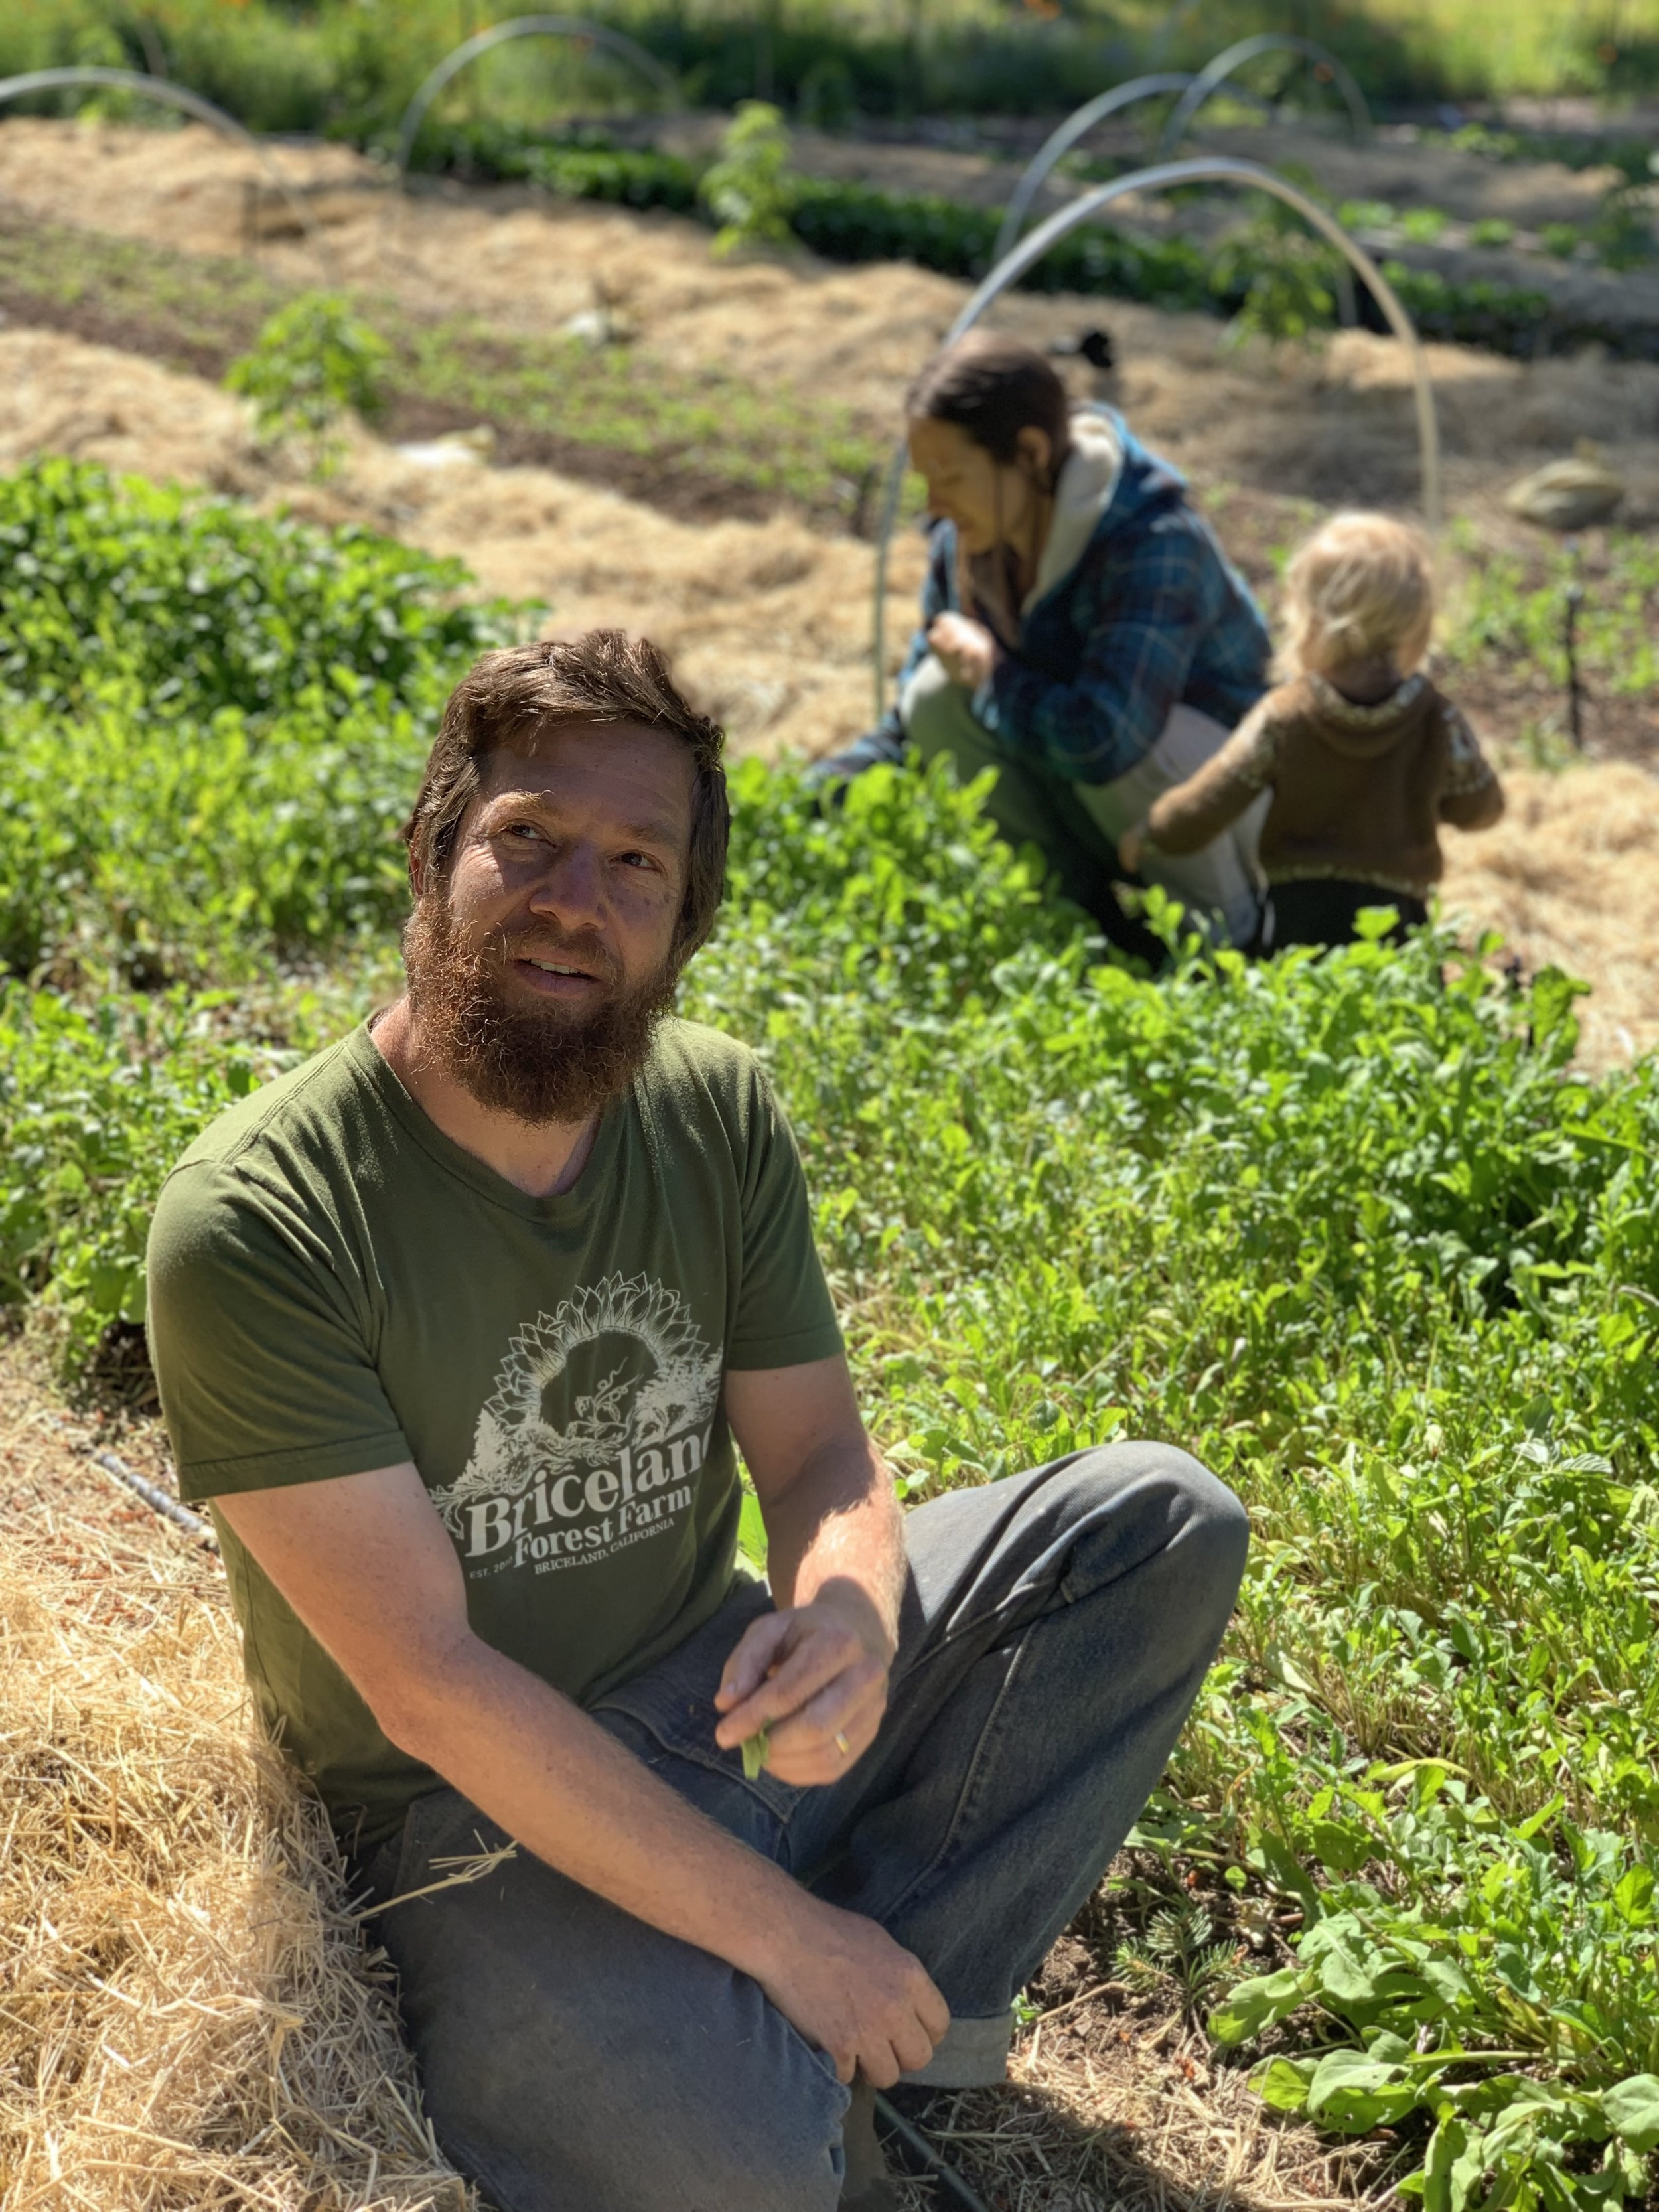 Follow the  @BricelandForestFarm  family on Instagram for regenerative farming tips. And explore their website at  Bricelandforestfarm.com .